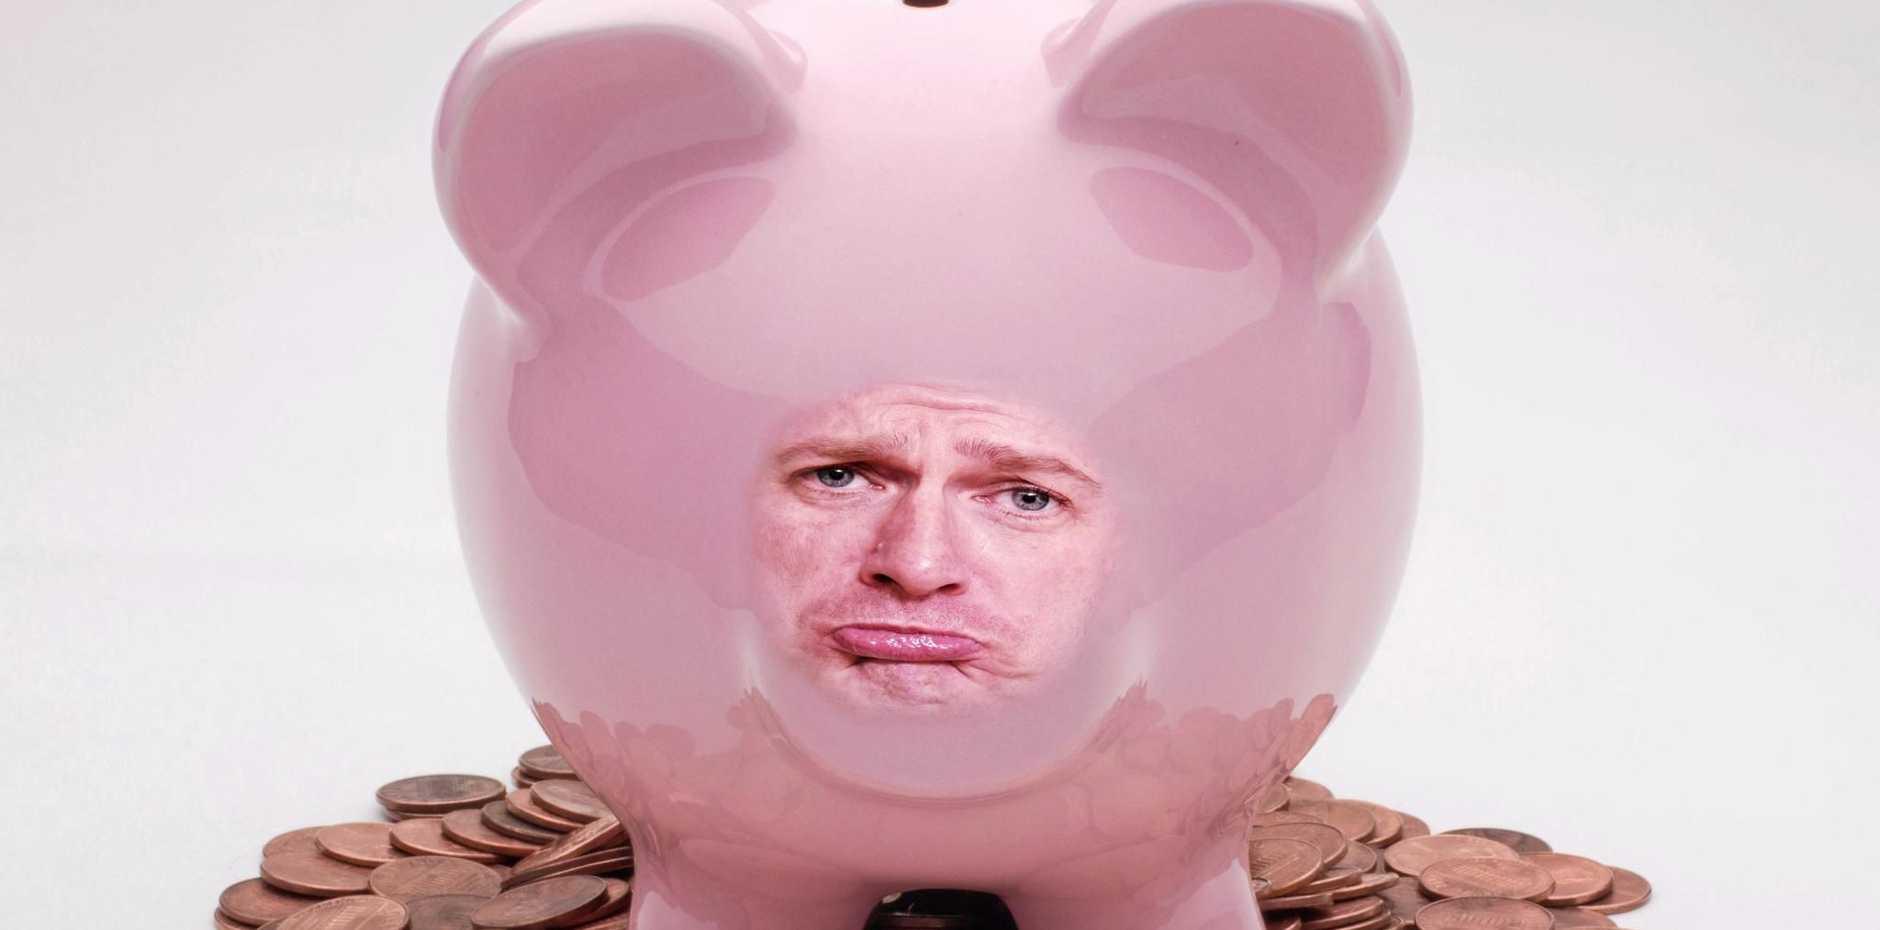 DRAIN YOU: Darren's Piggy Bank is feeling the pain.